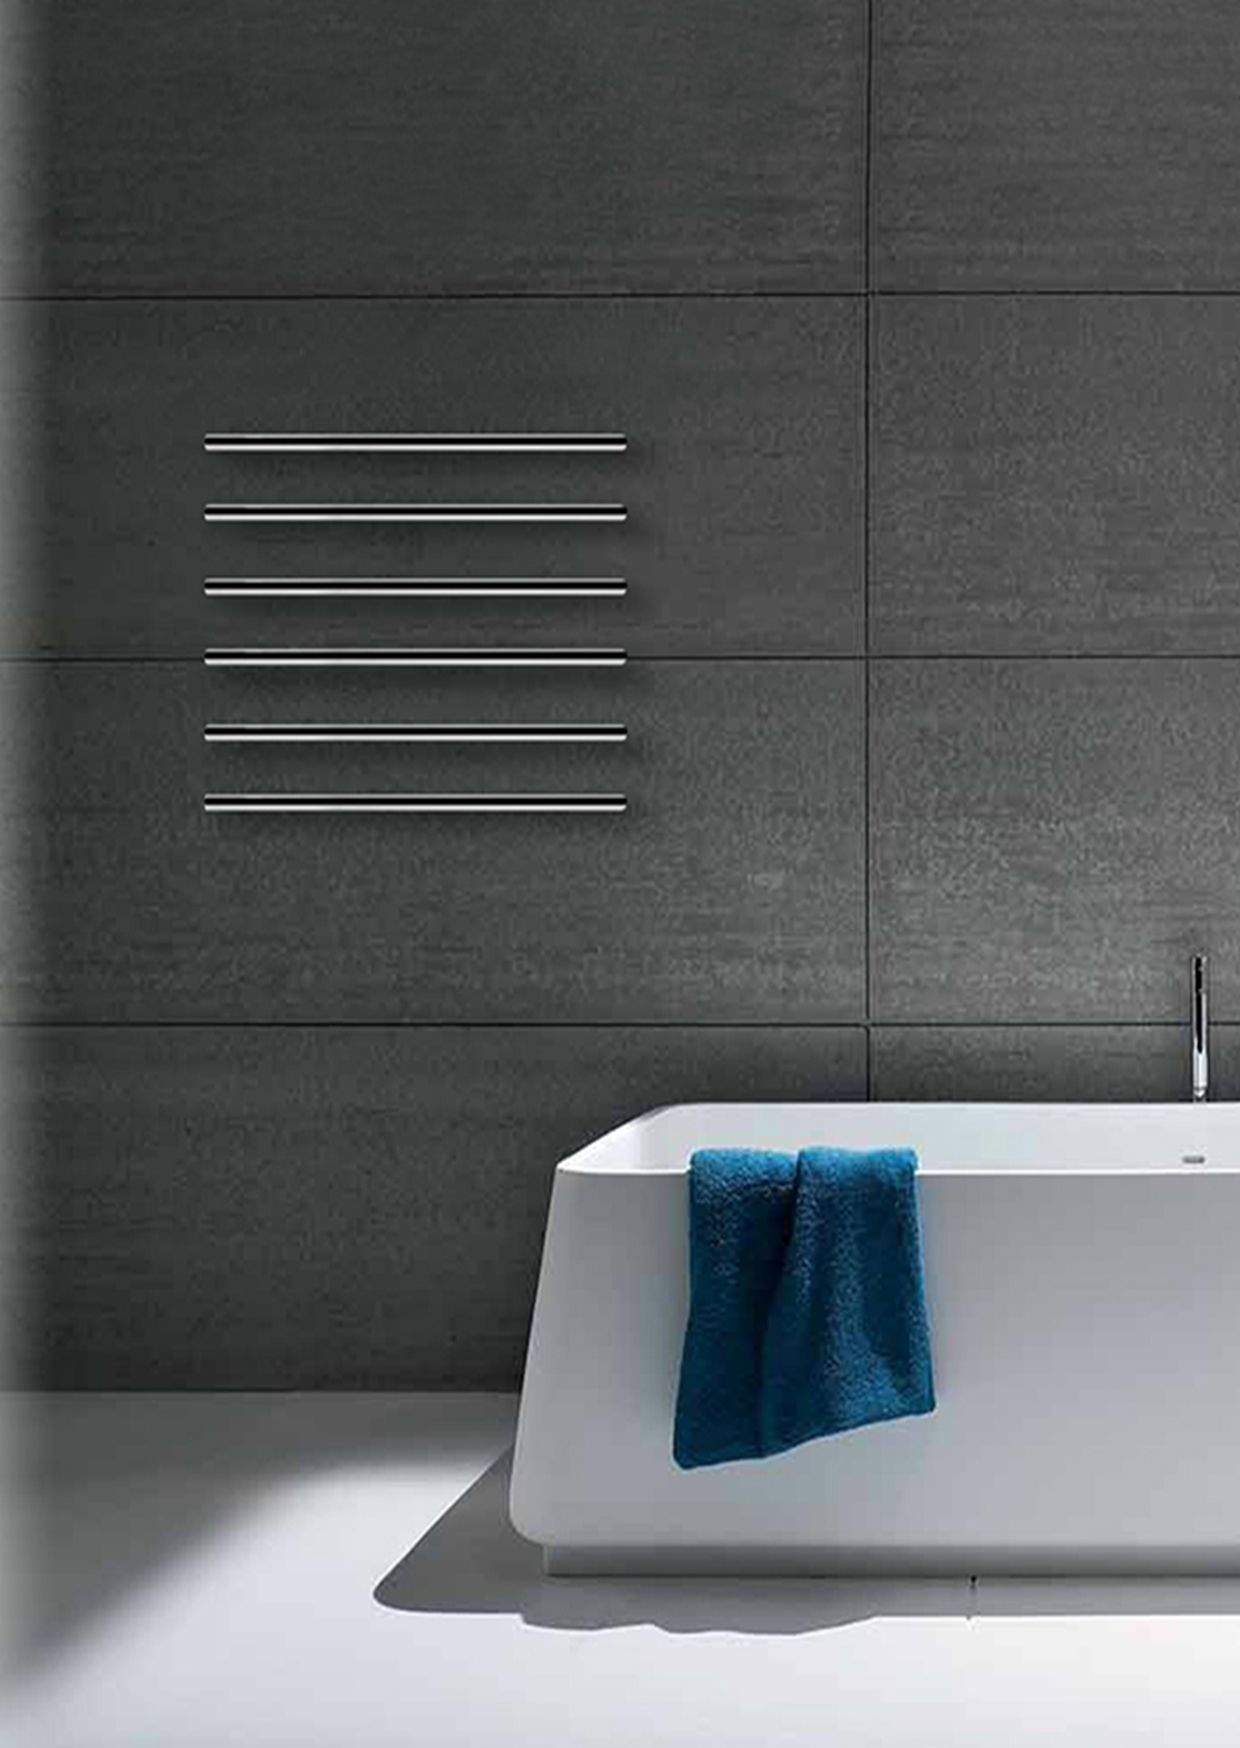 Seche Serviette Design Vd 1611 Foursteel Varela Design Seche